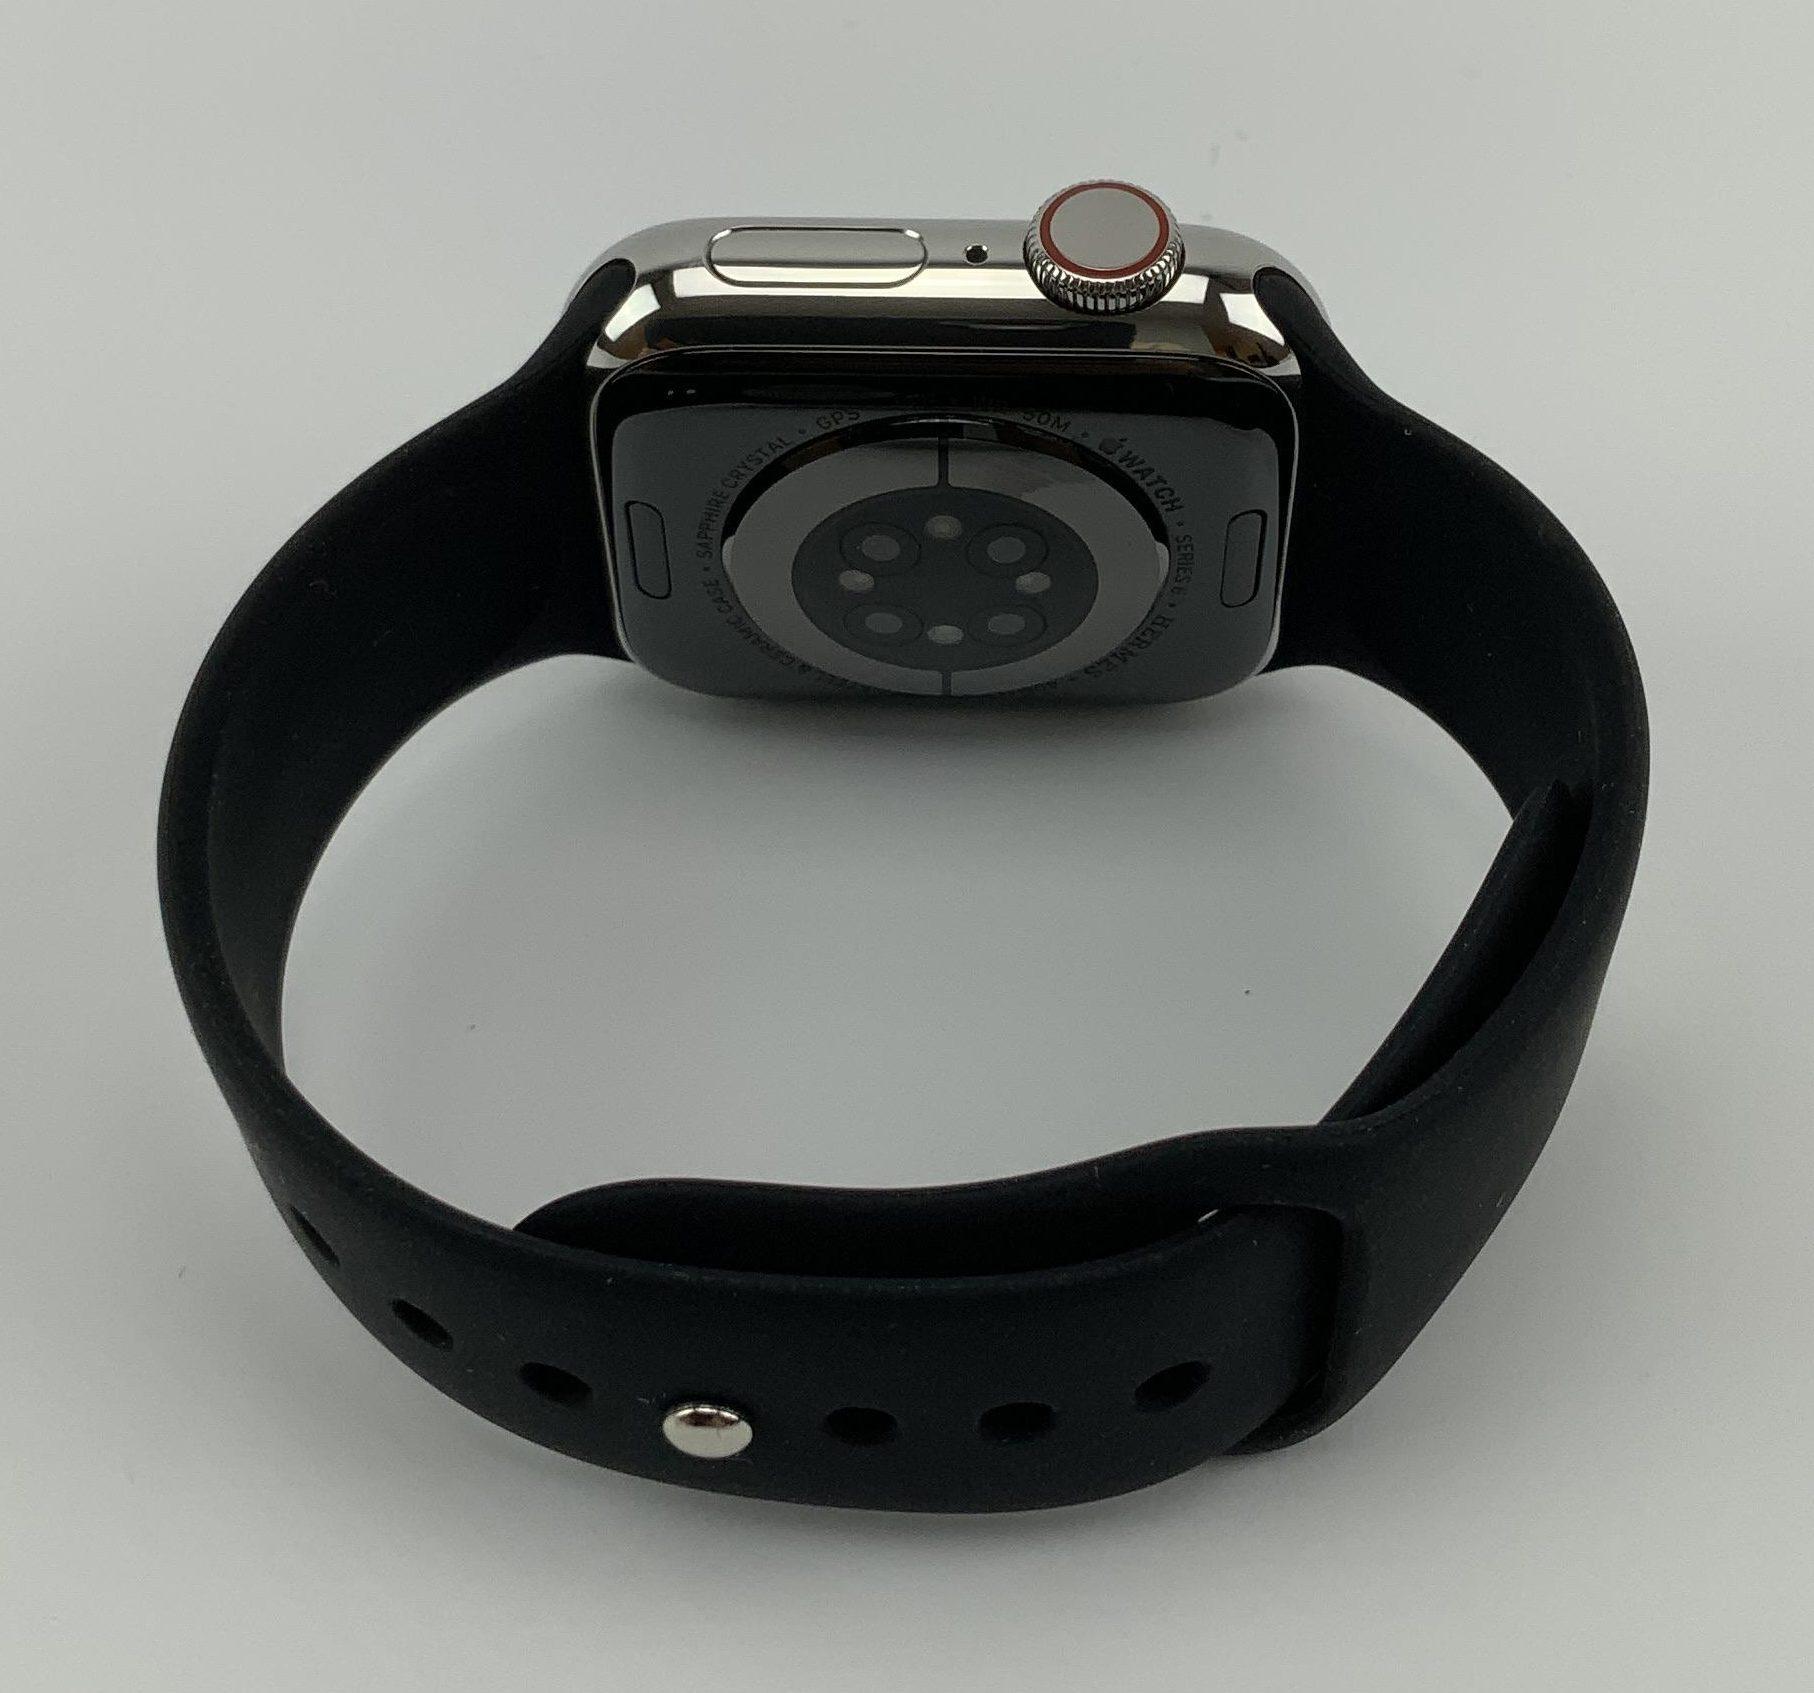 Watch Series 6 Steel Cellular (40mm), Silver, imagen 2